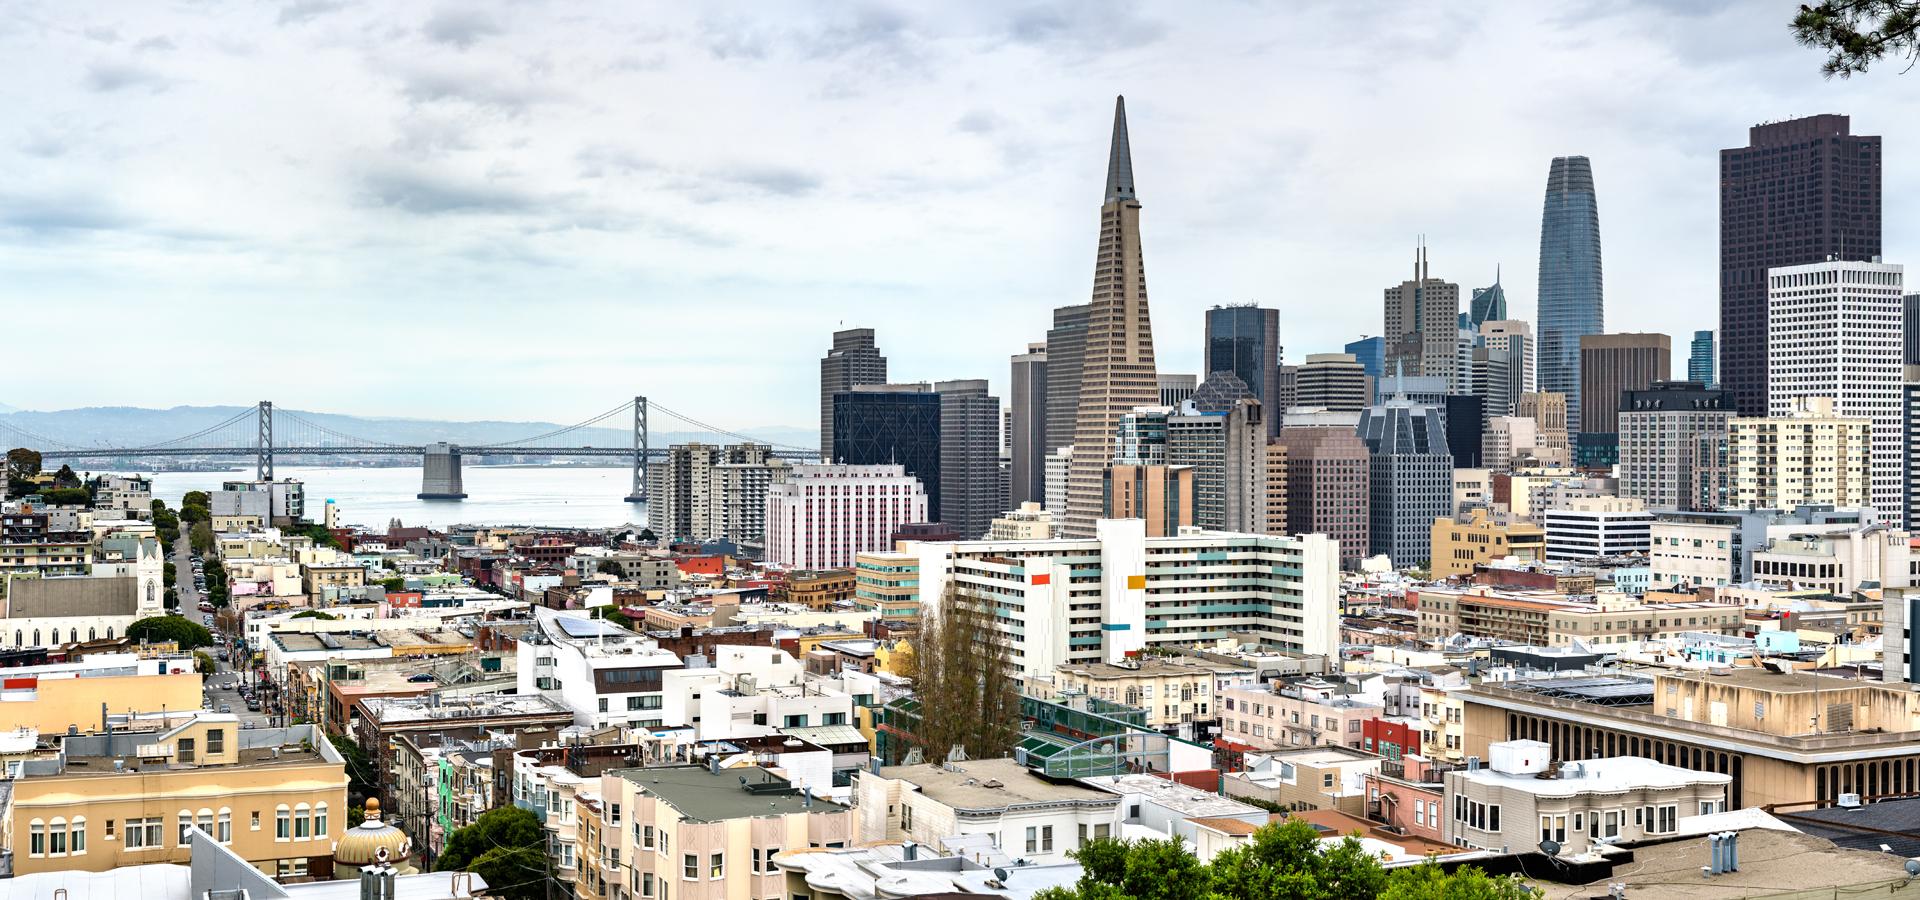 <b>San Francisco, California, USA</b>